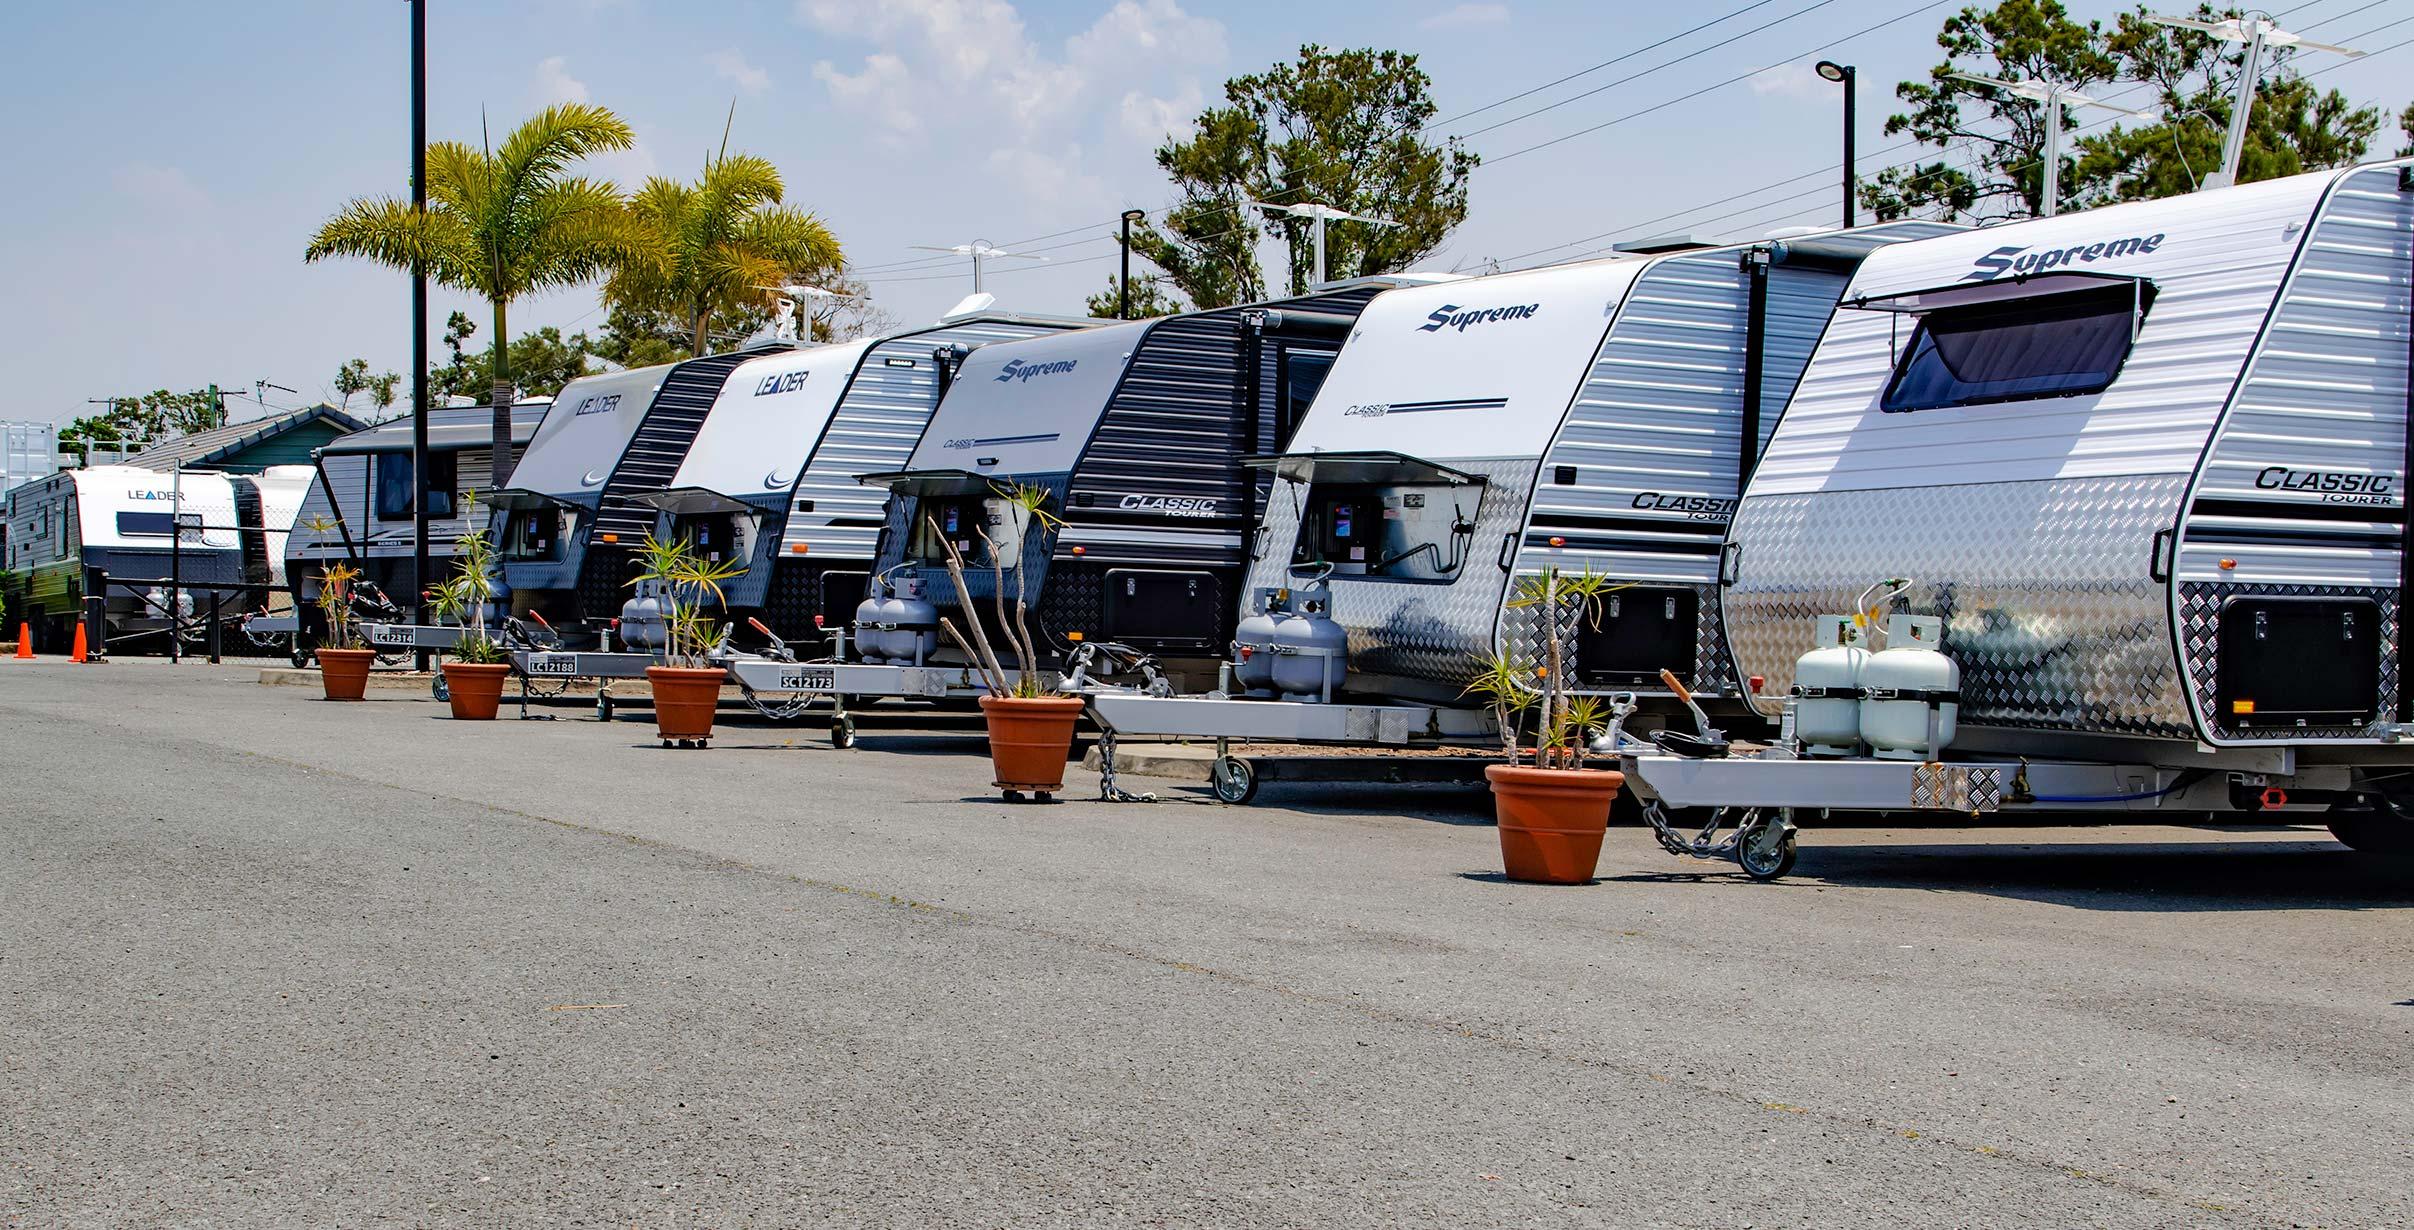 Burleigh Heads Caravan Dealership